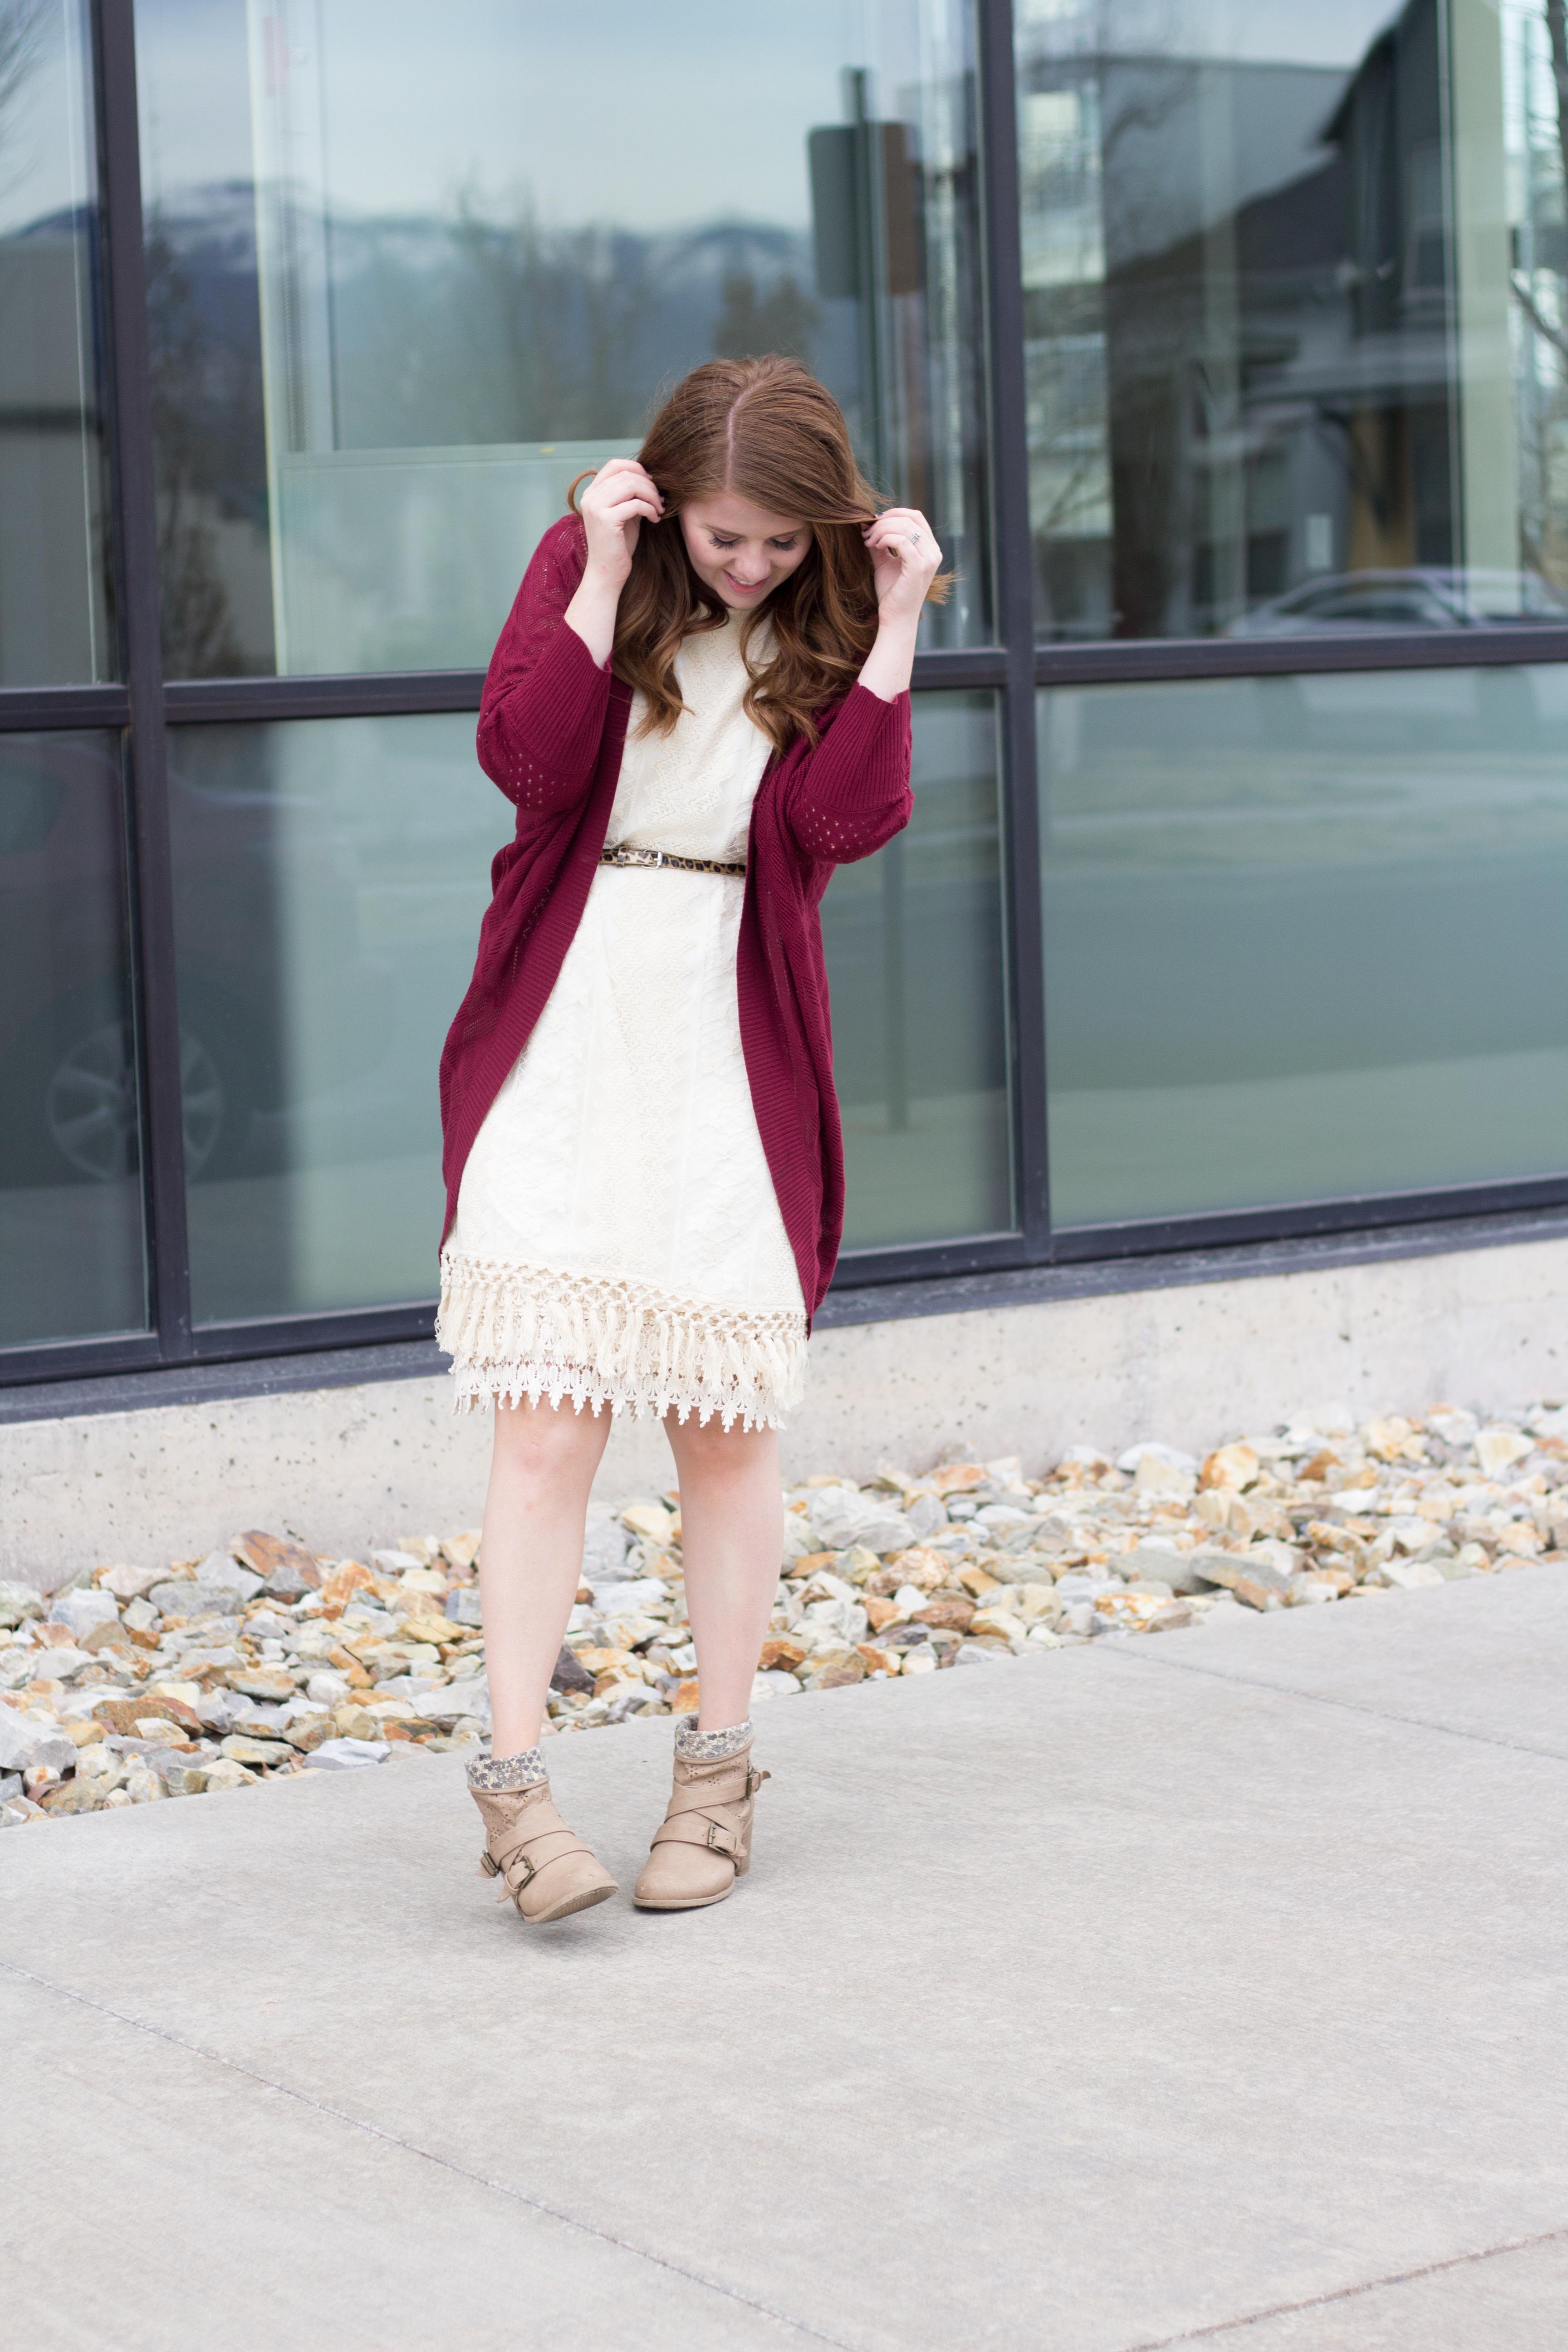 minimalist wardrobe: shoes